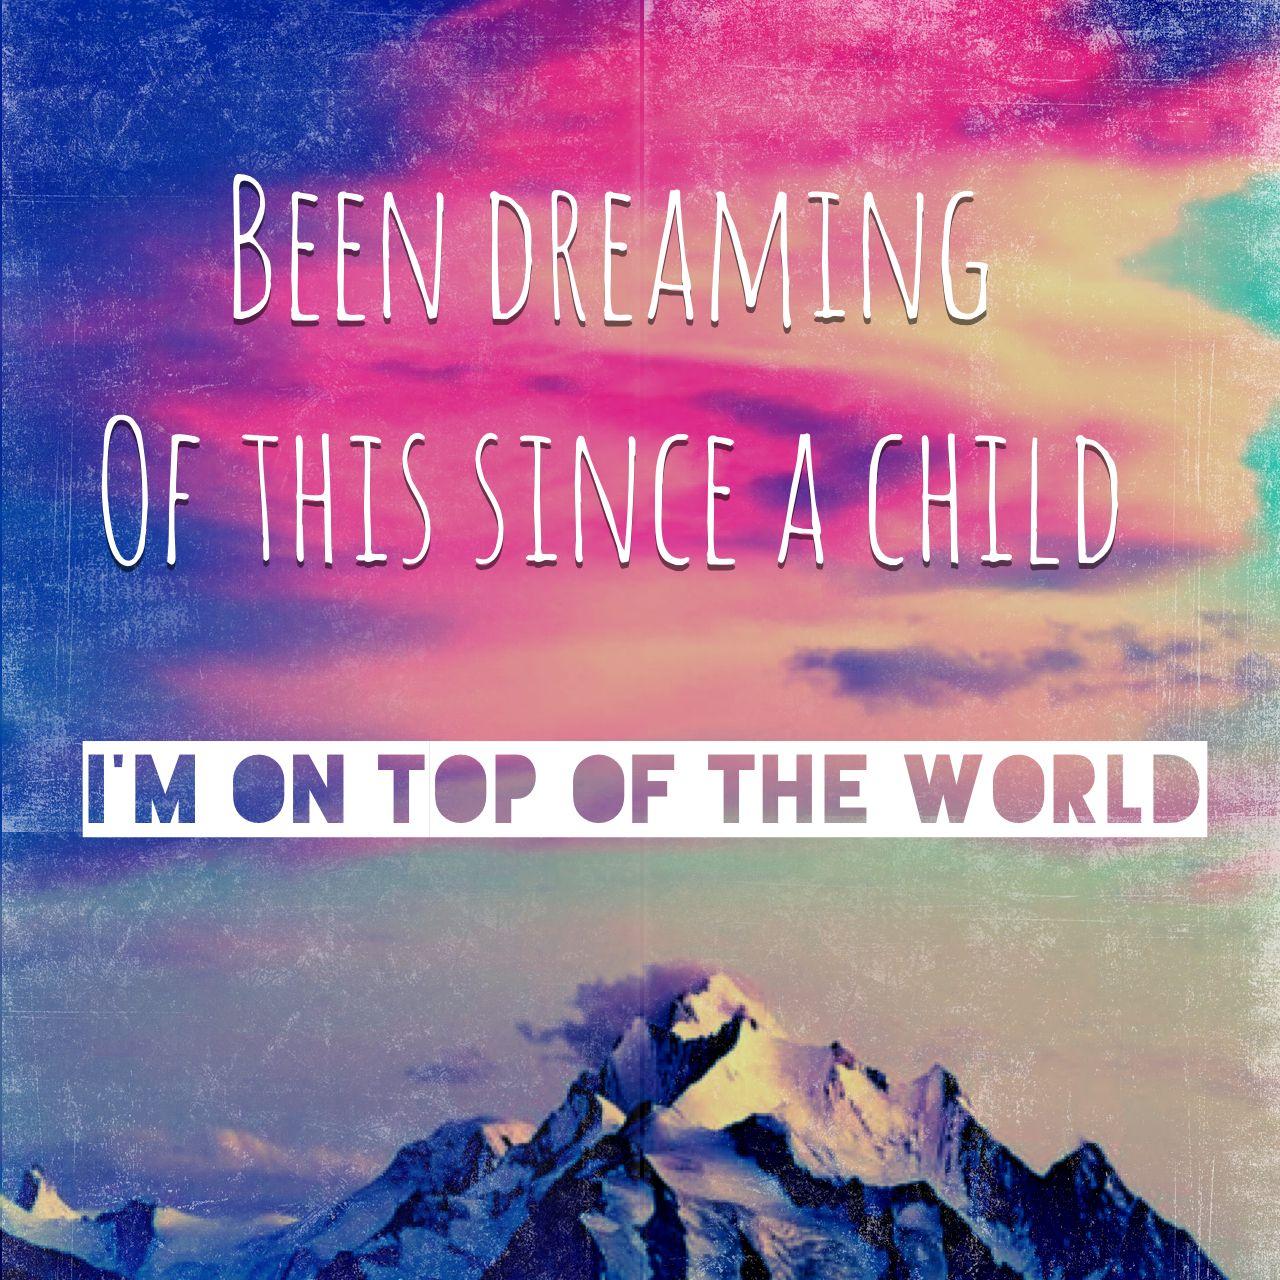 On top of the world- Imagine Dragons | Lyrics | Pinterest